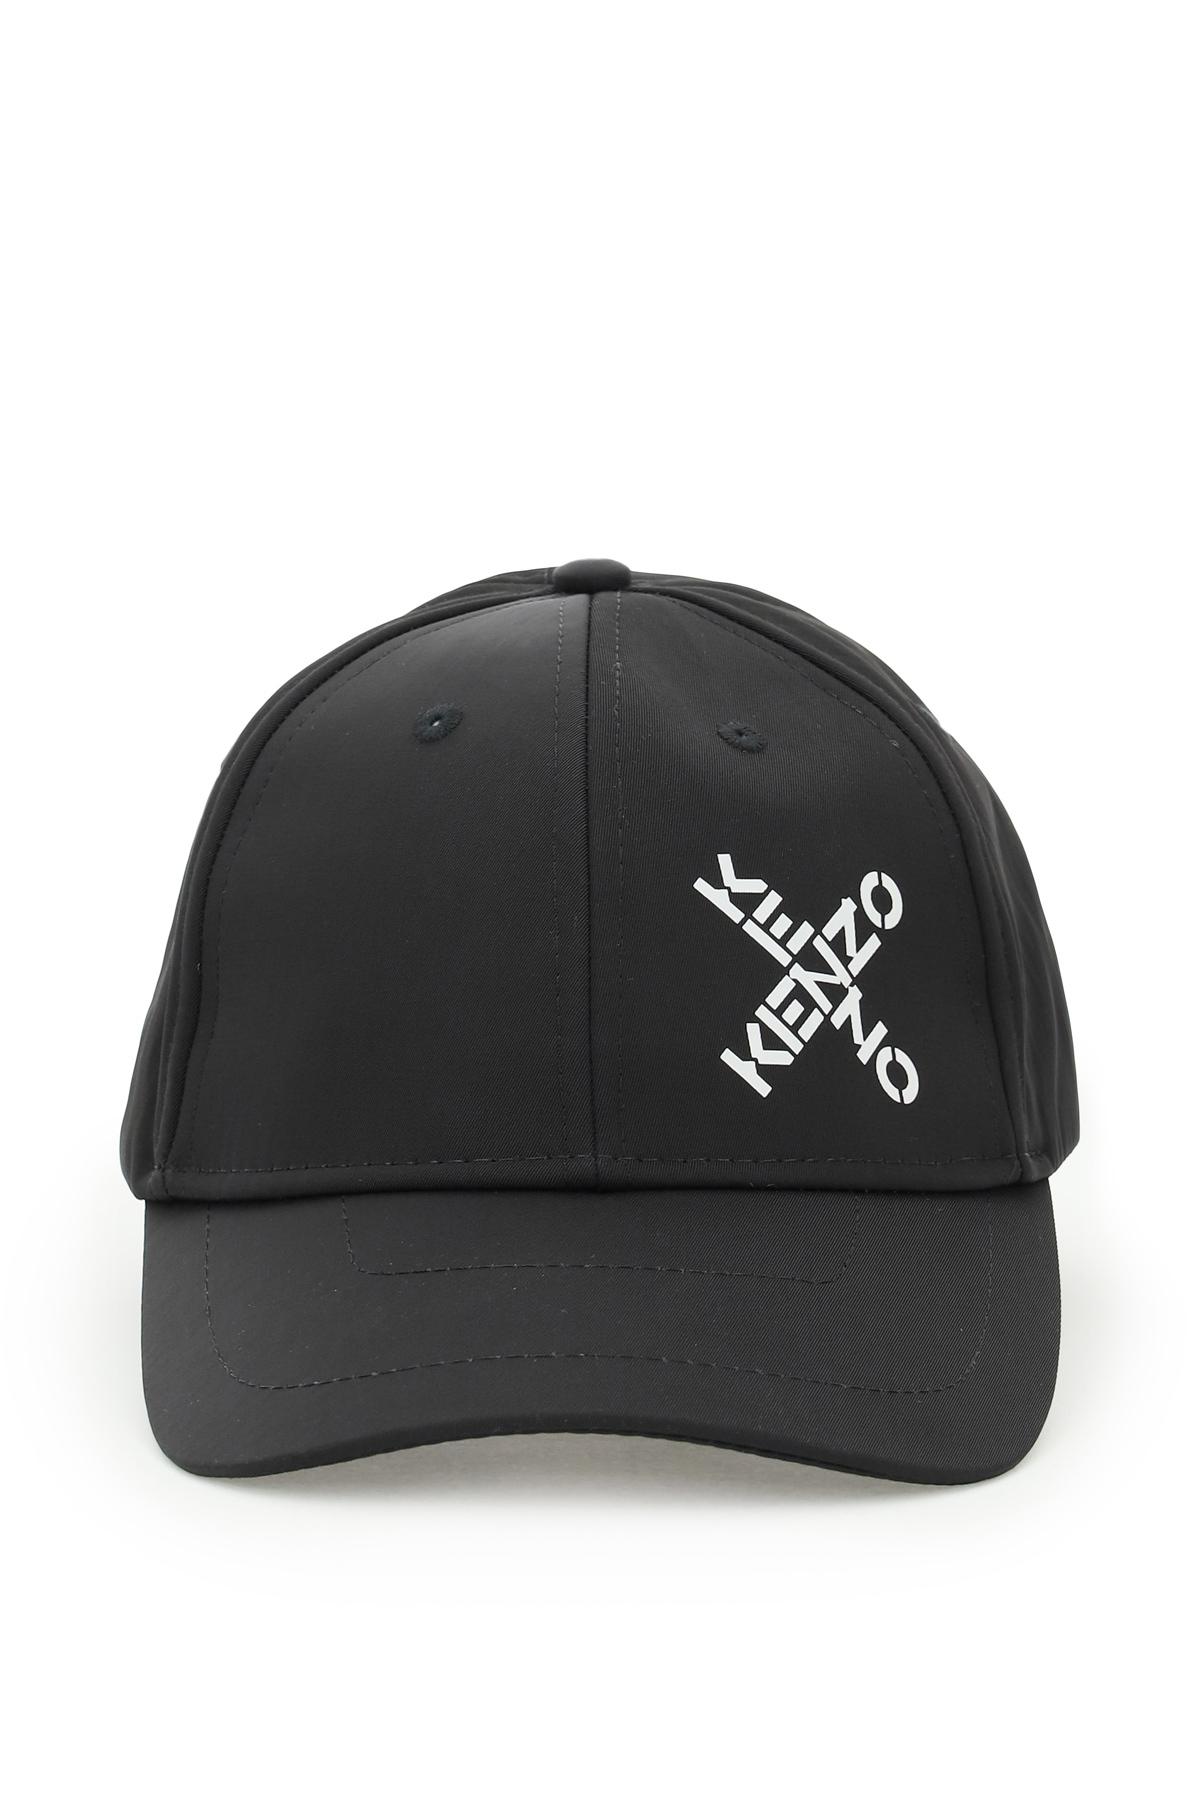 Kenzo cappello baseball logo cross